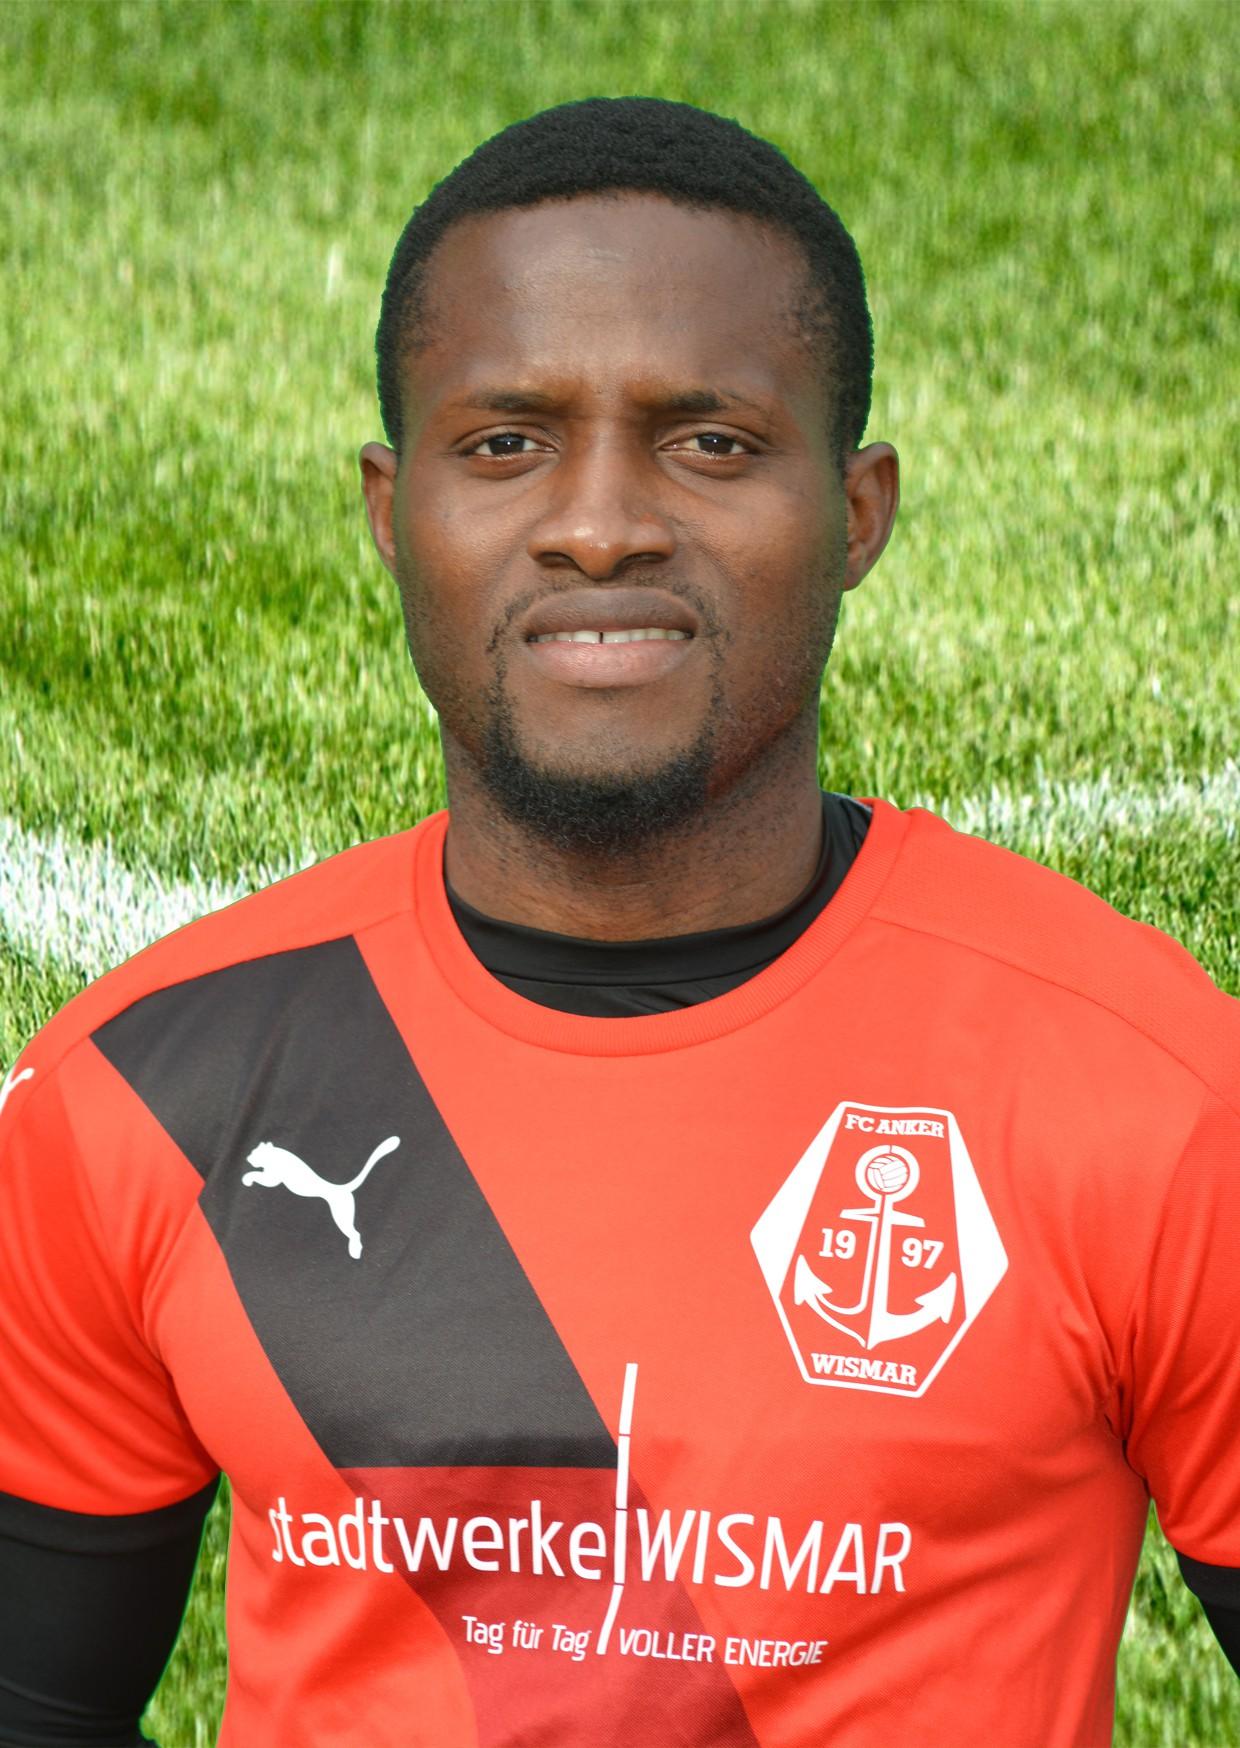 "<strong class=""sp-player-number"">7</strong> Ivanir Pais Rodrigues"